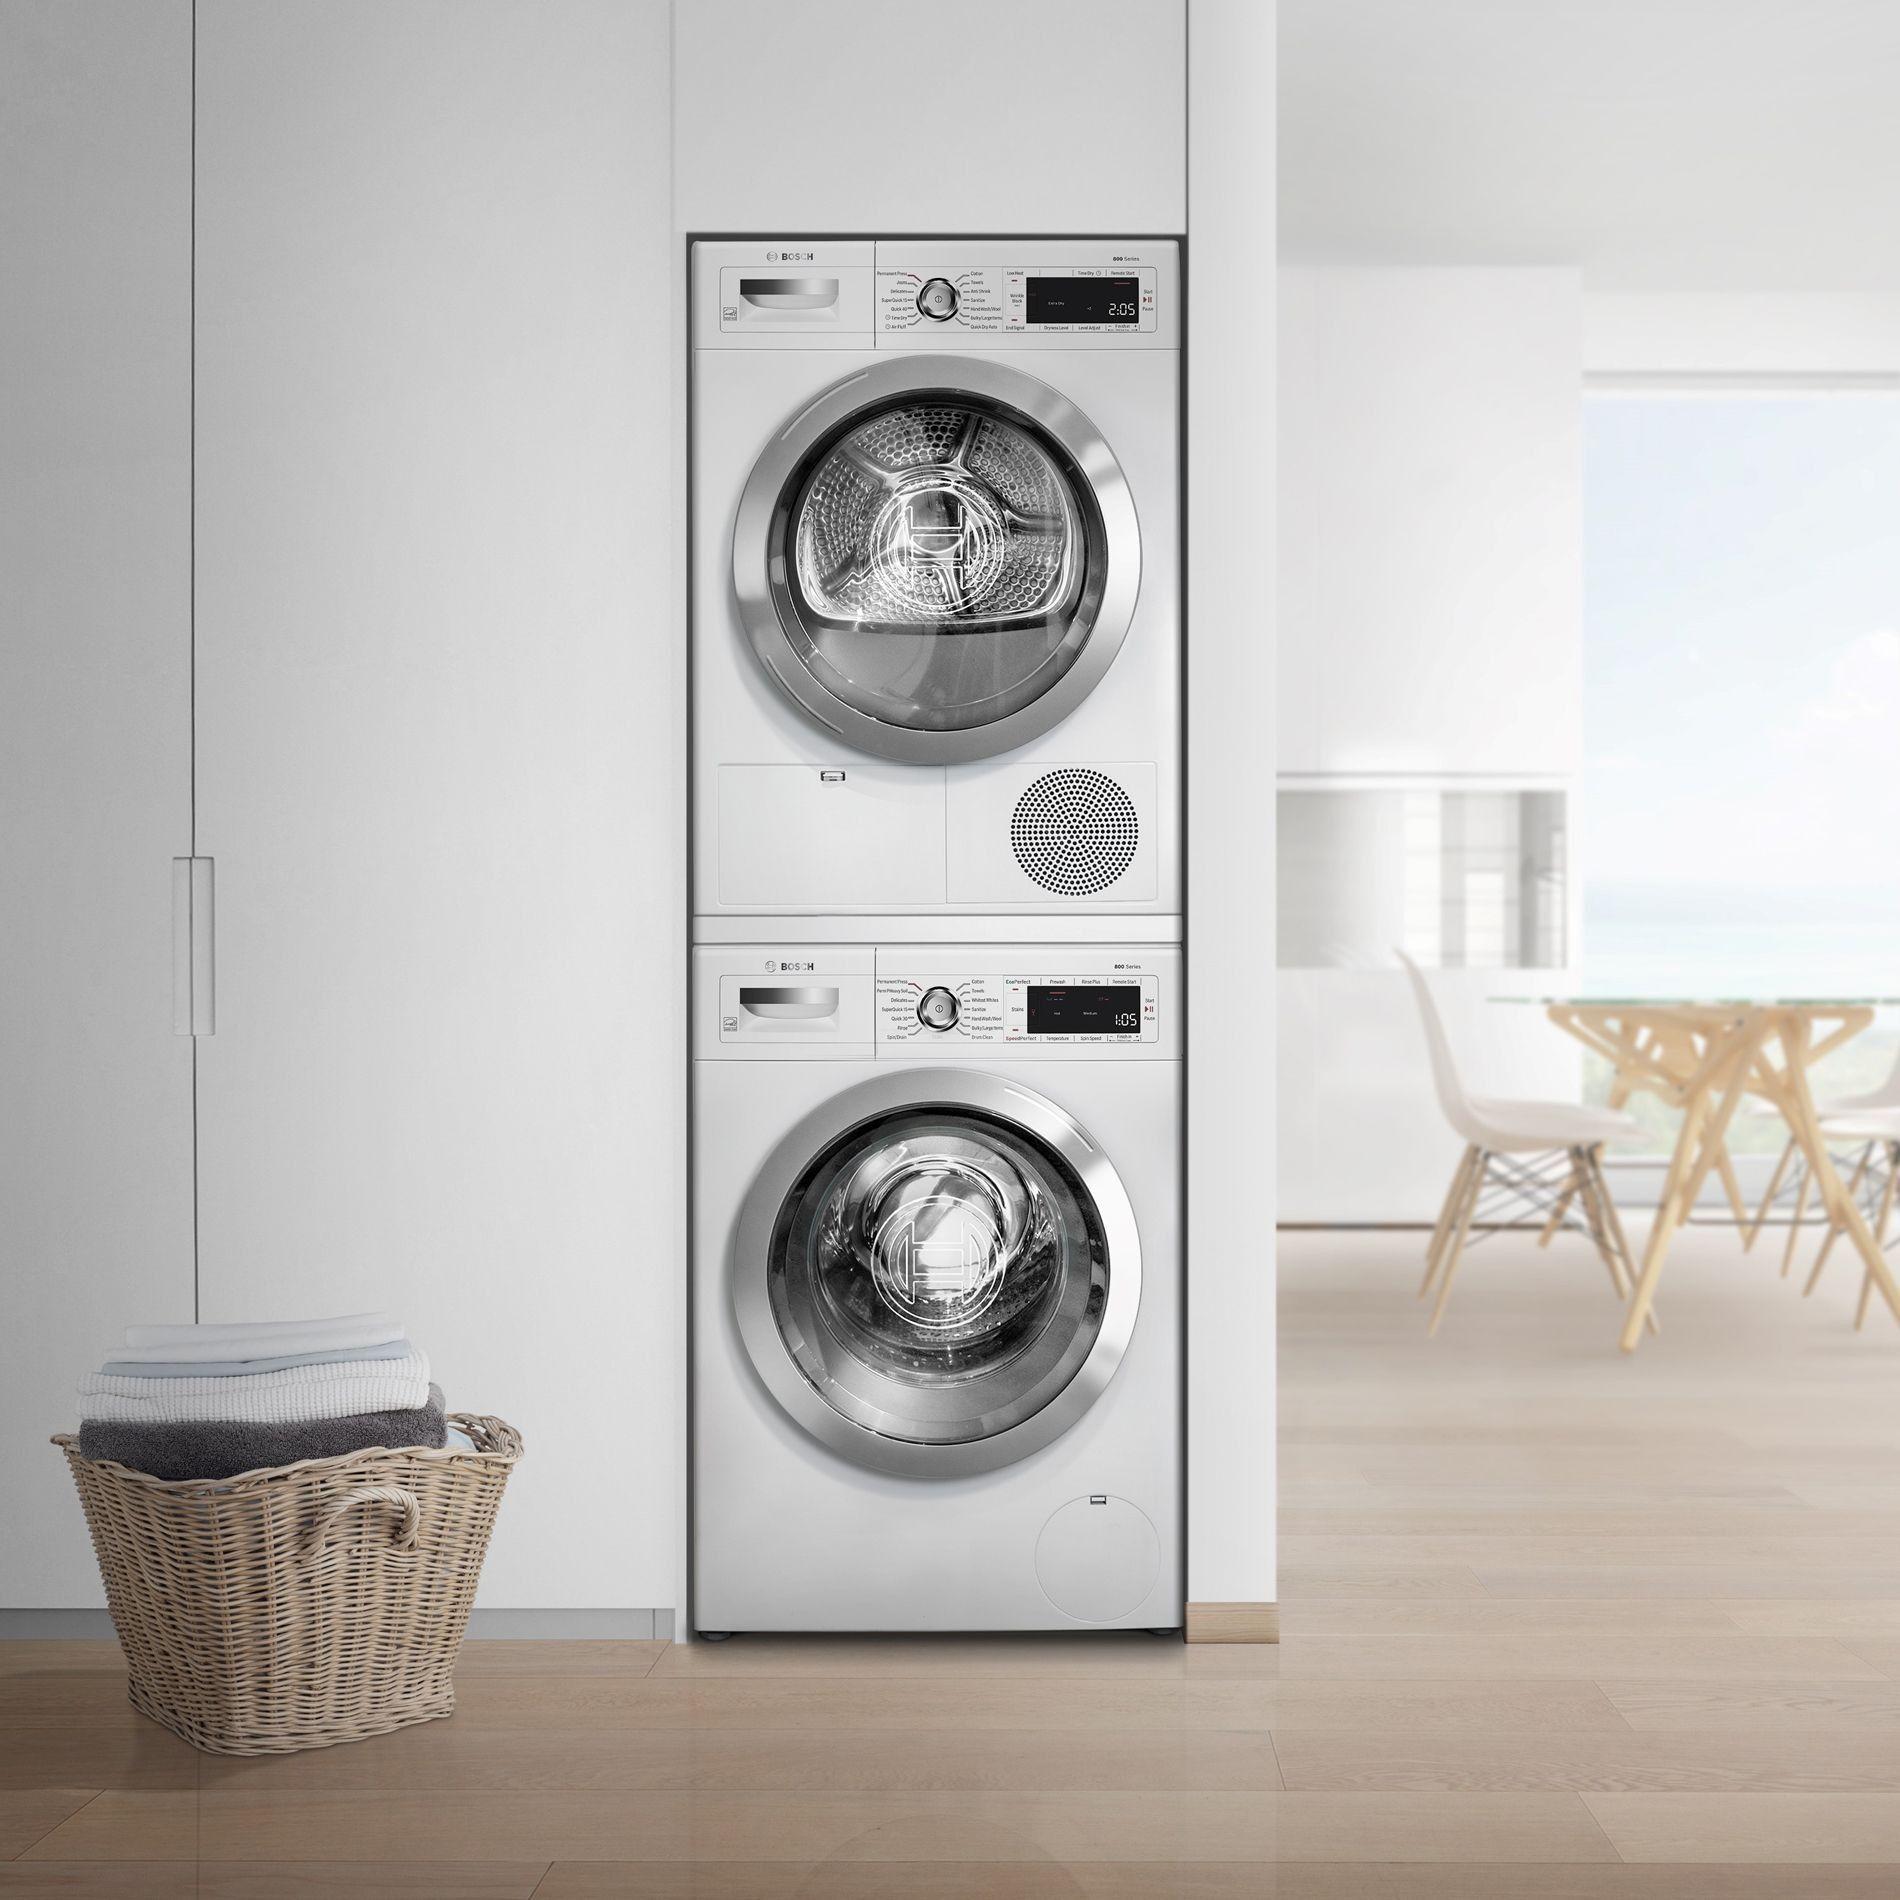 Bosch 800 Series Bowadrew868 Washer Dryer Set Washer And Dryer